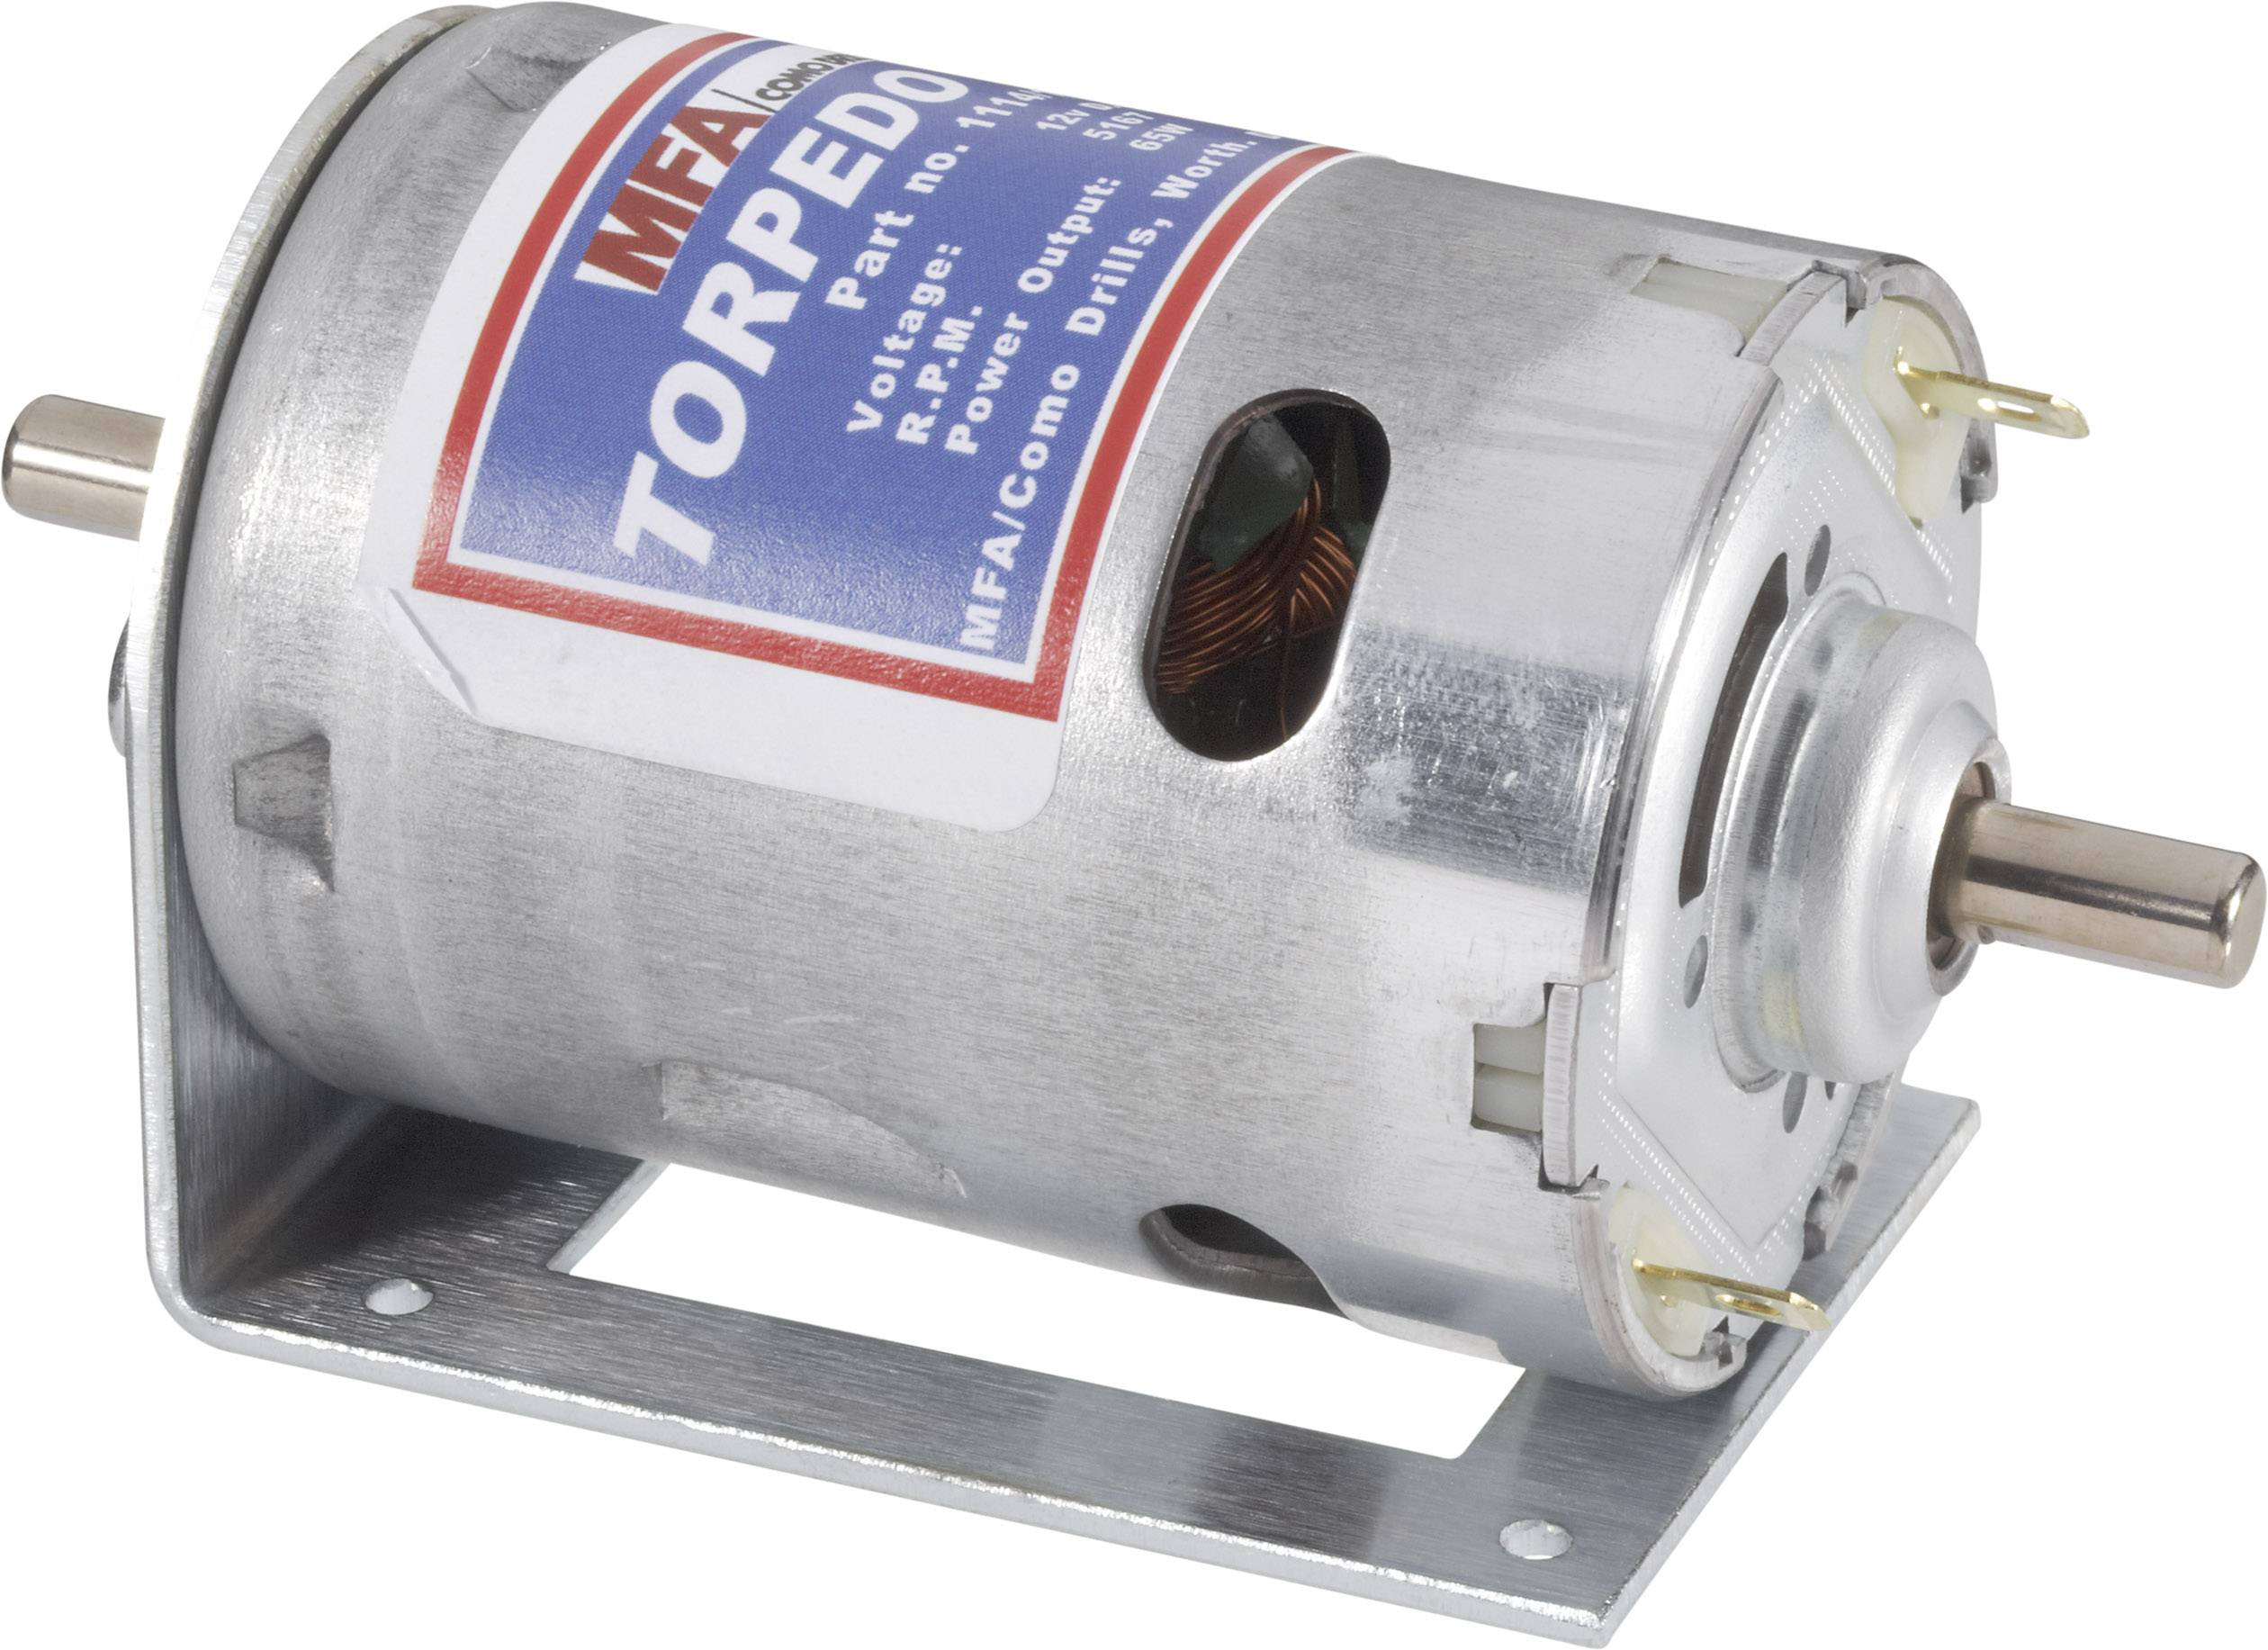 Motori elettrici per modellismo navale offerprice